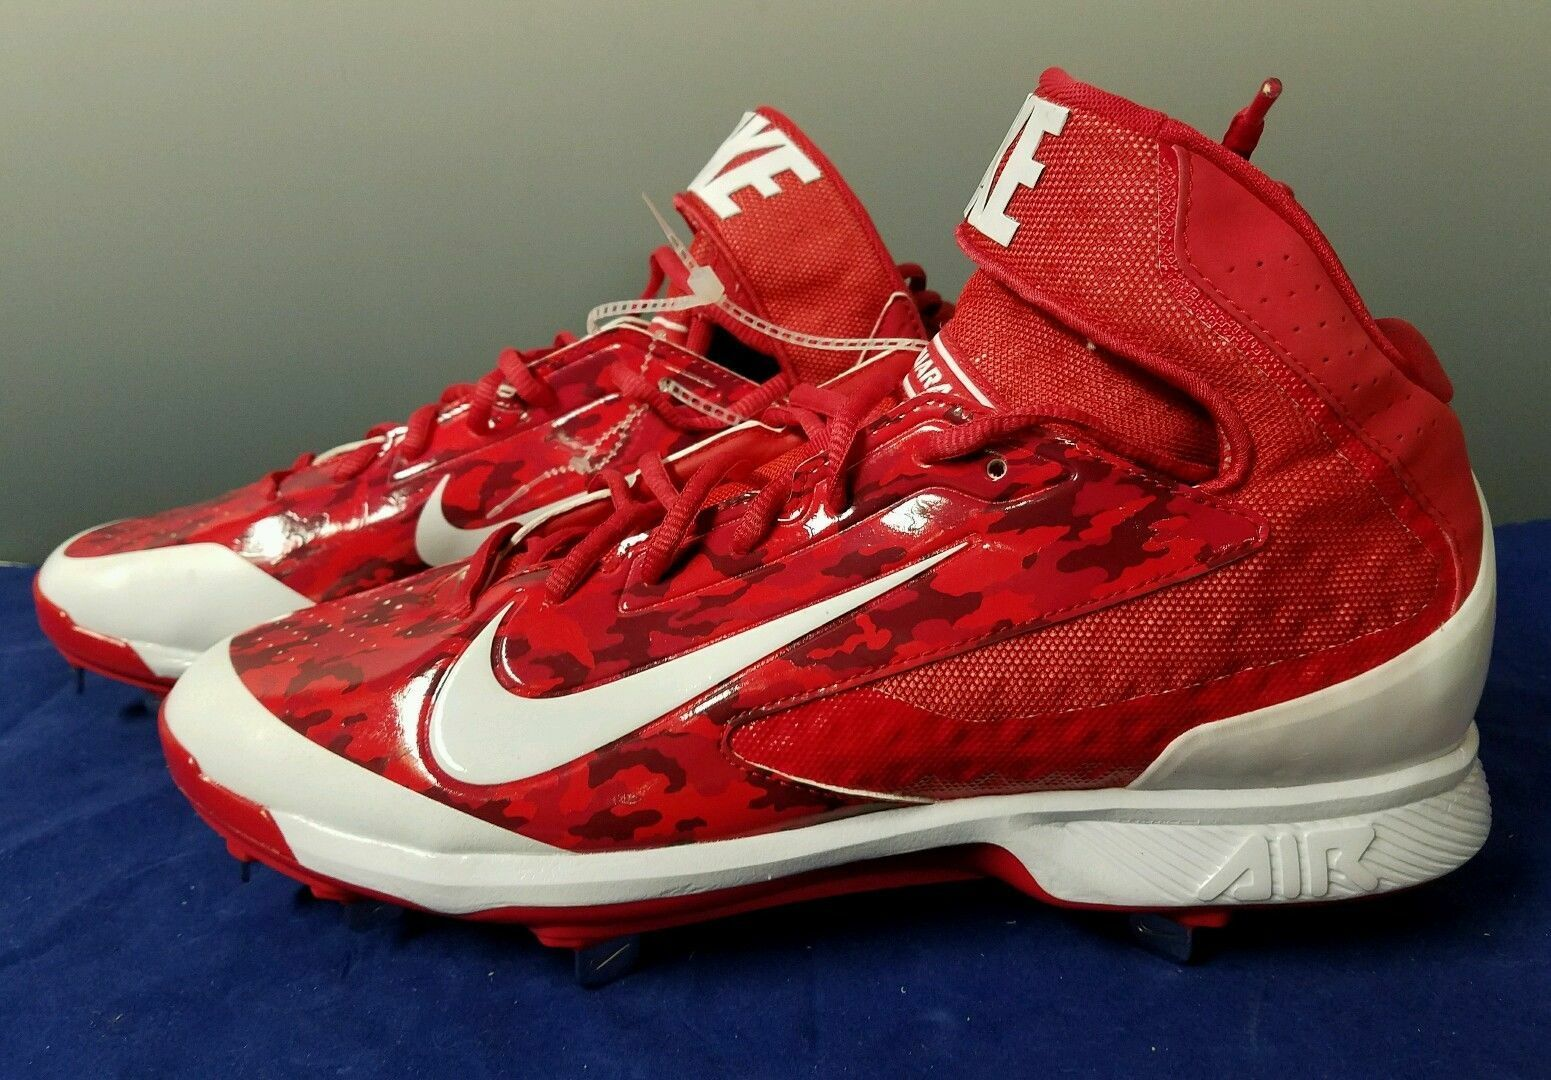 Nike Air Huarache  Pro Metal mediados De Metal Béisbol Universidad Rojo blancoo 599235-699  Tienda 2018